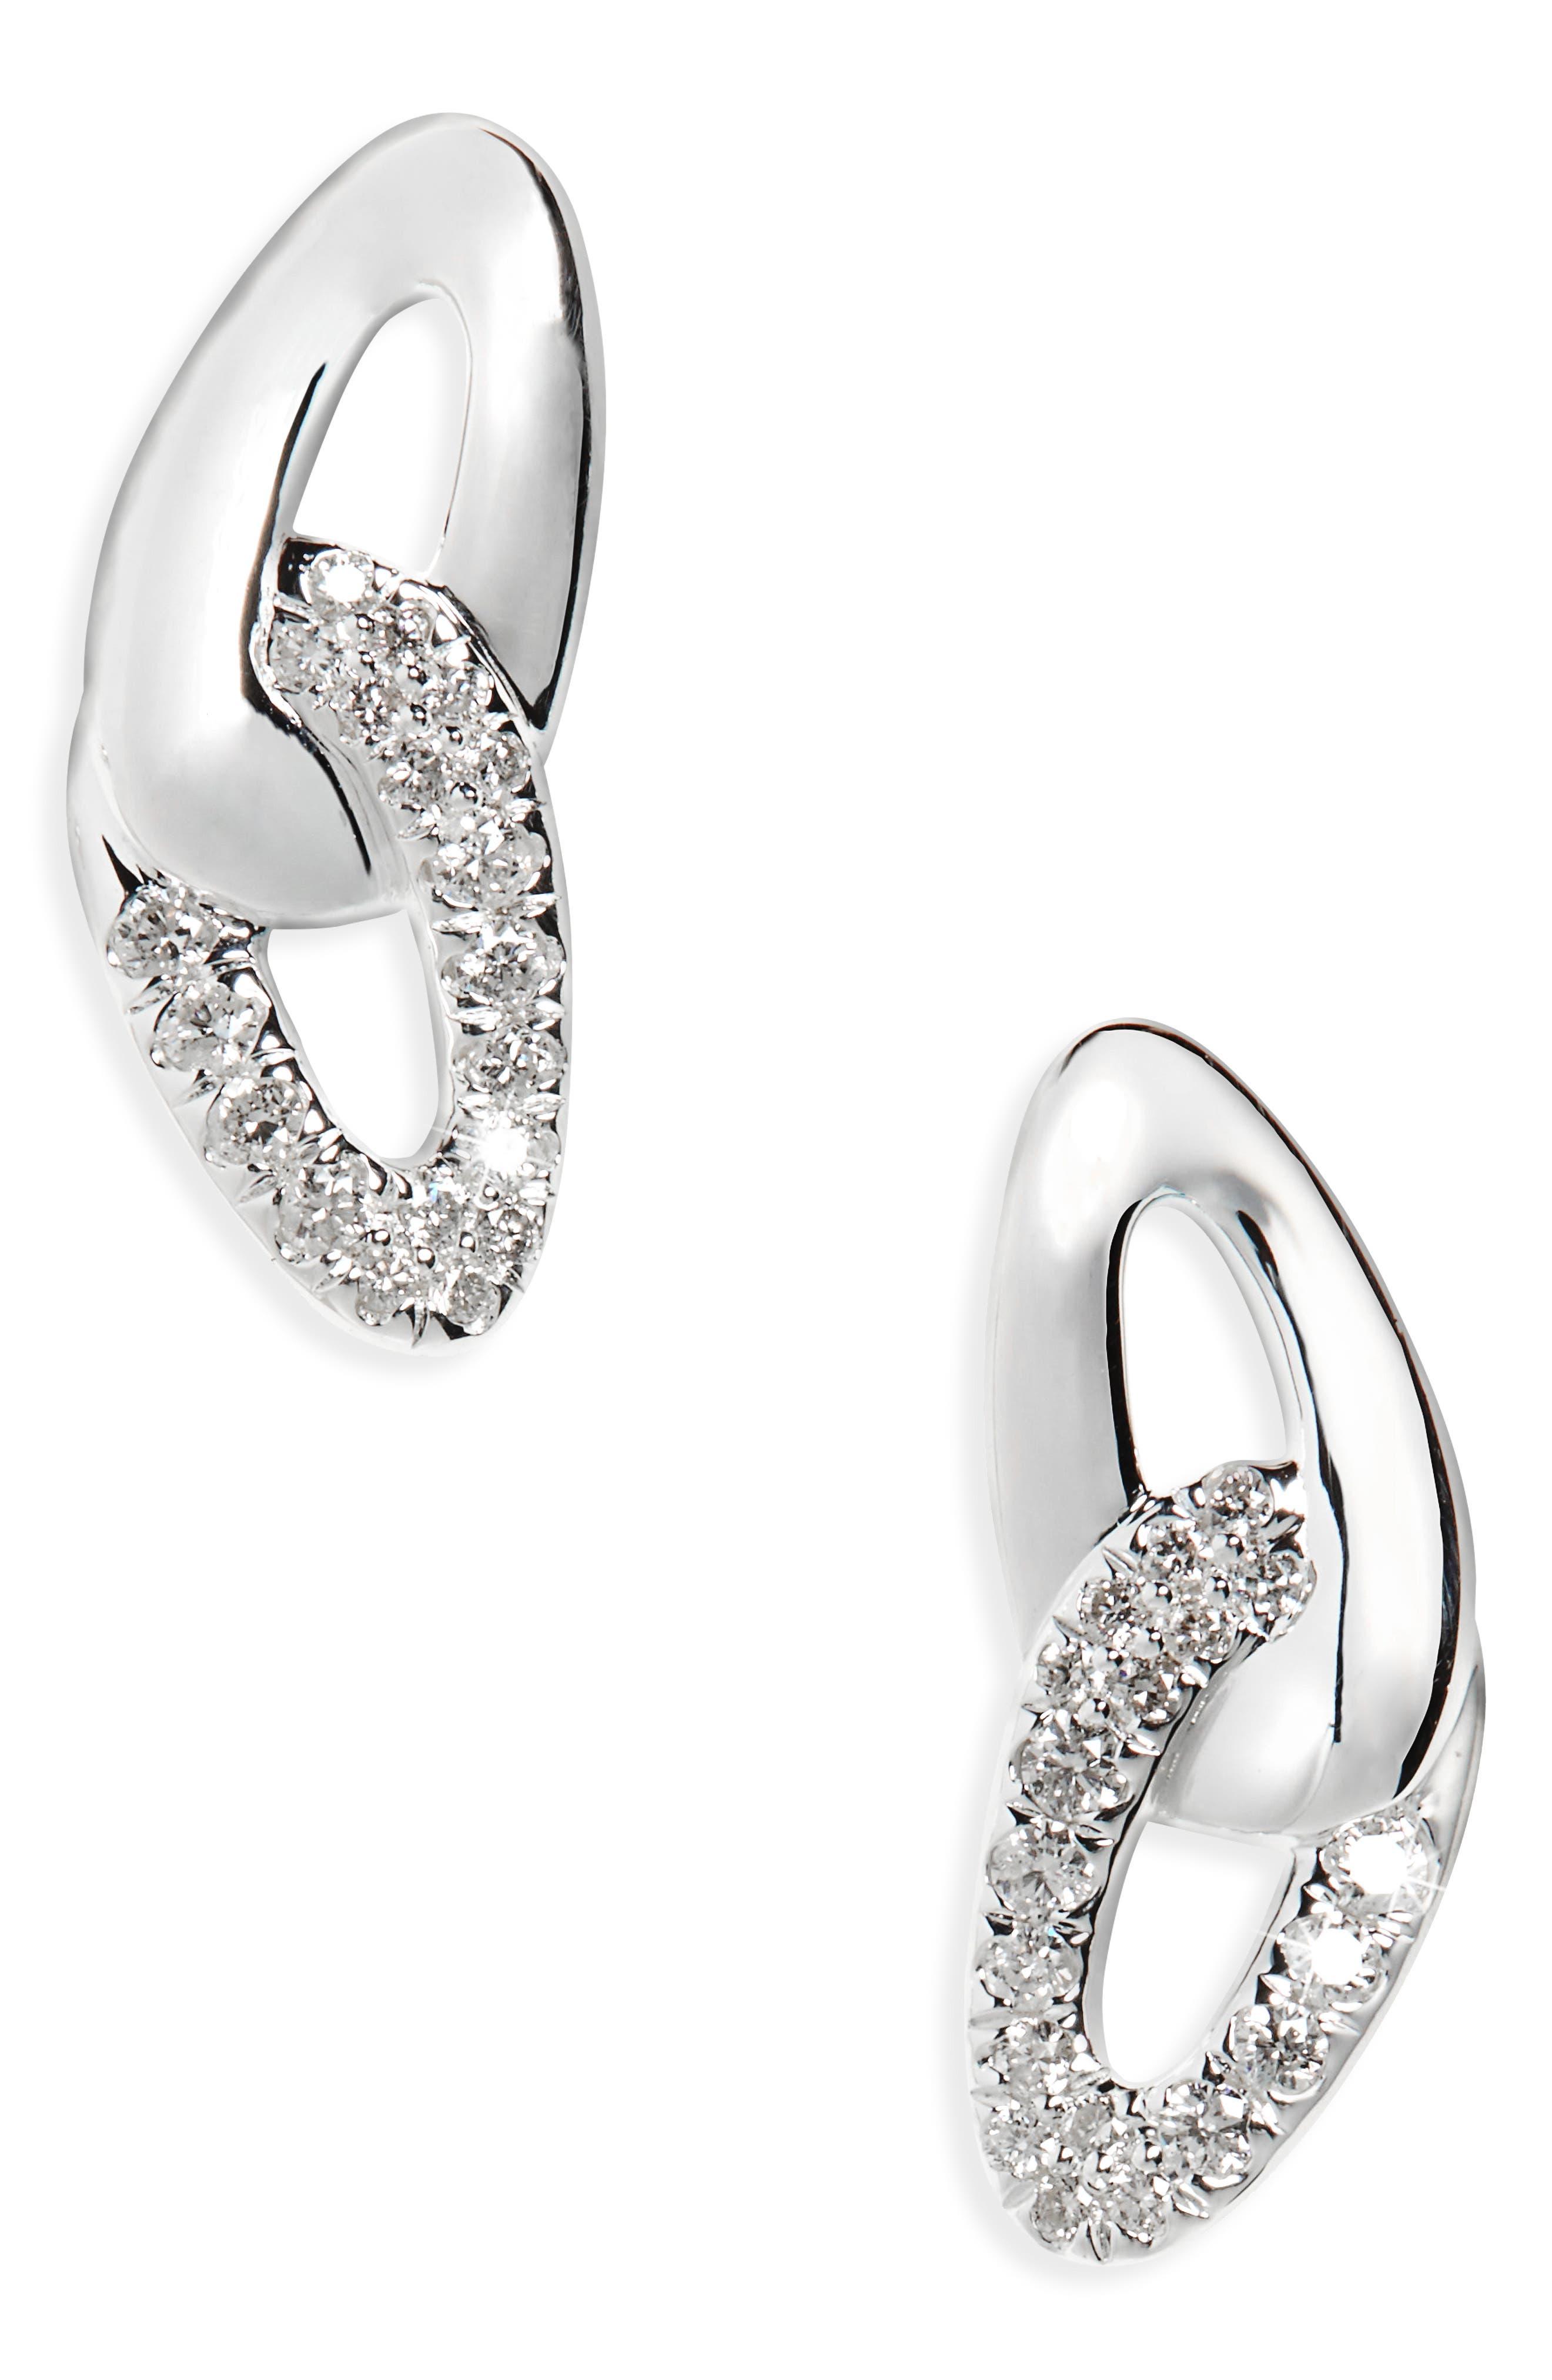 Cherish Link Diamond Stud Earrings,                         Main,                         color, Silver